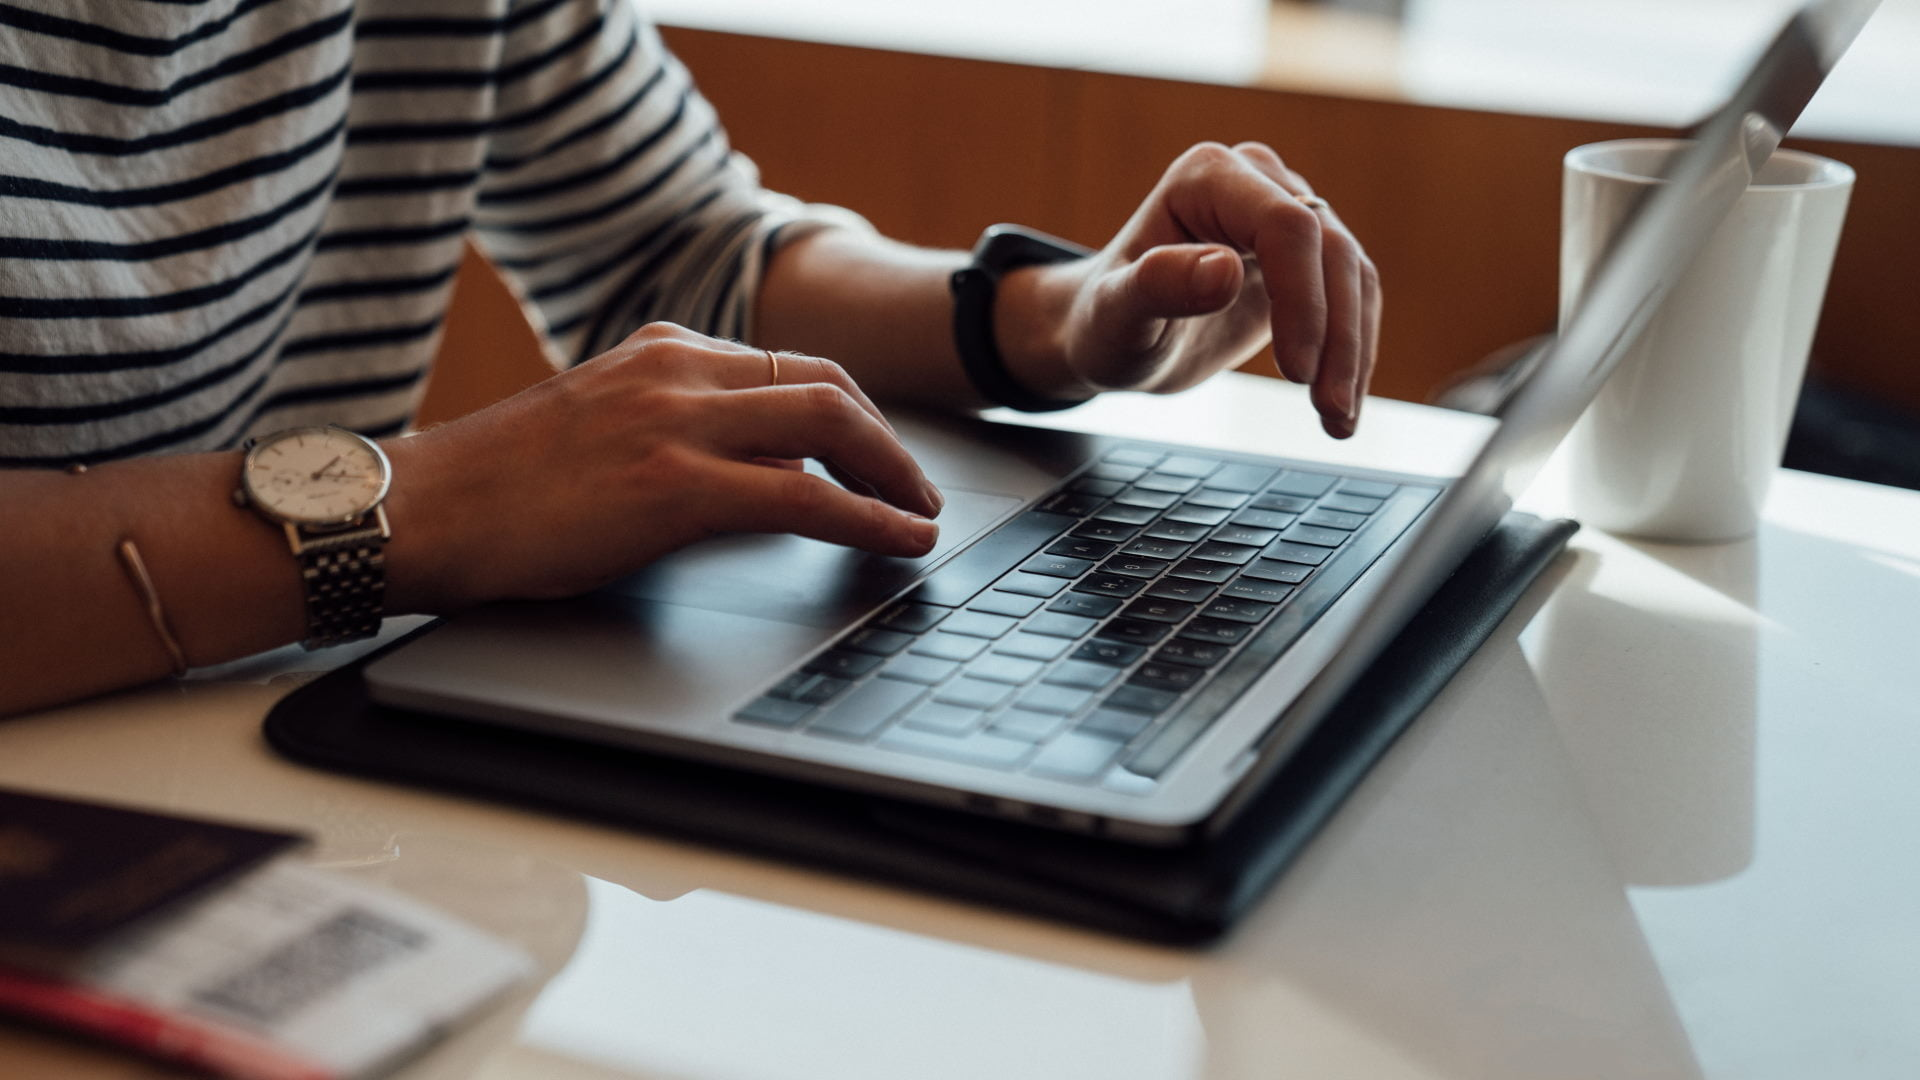 person laptop stock unsplash